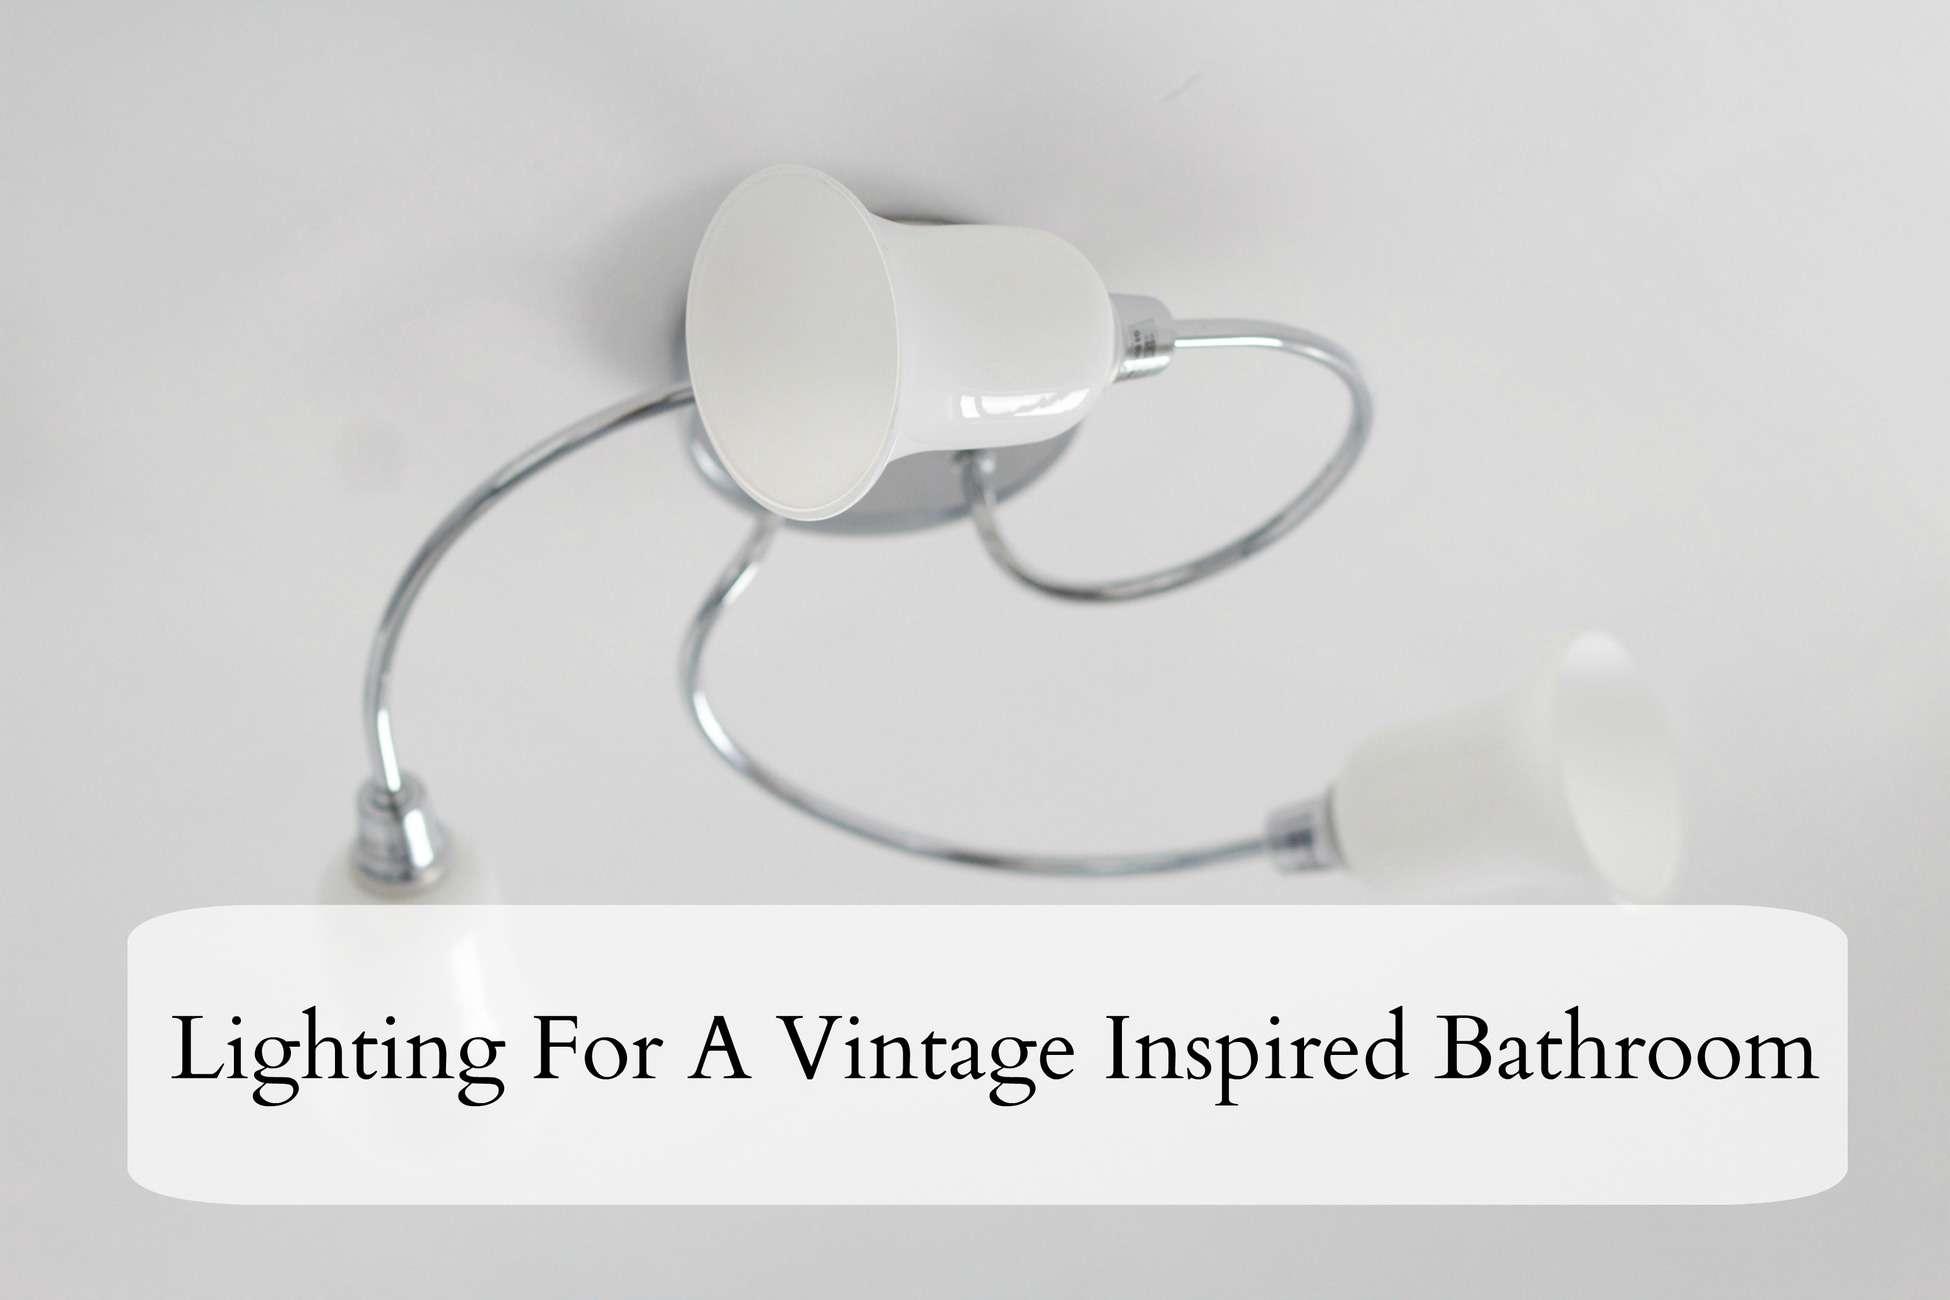 lighting for a vintage inspired bathroom